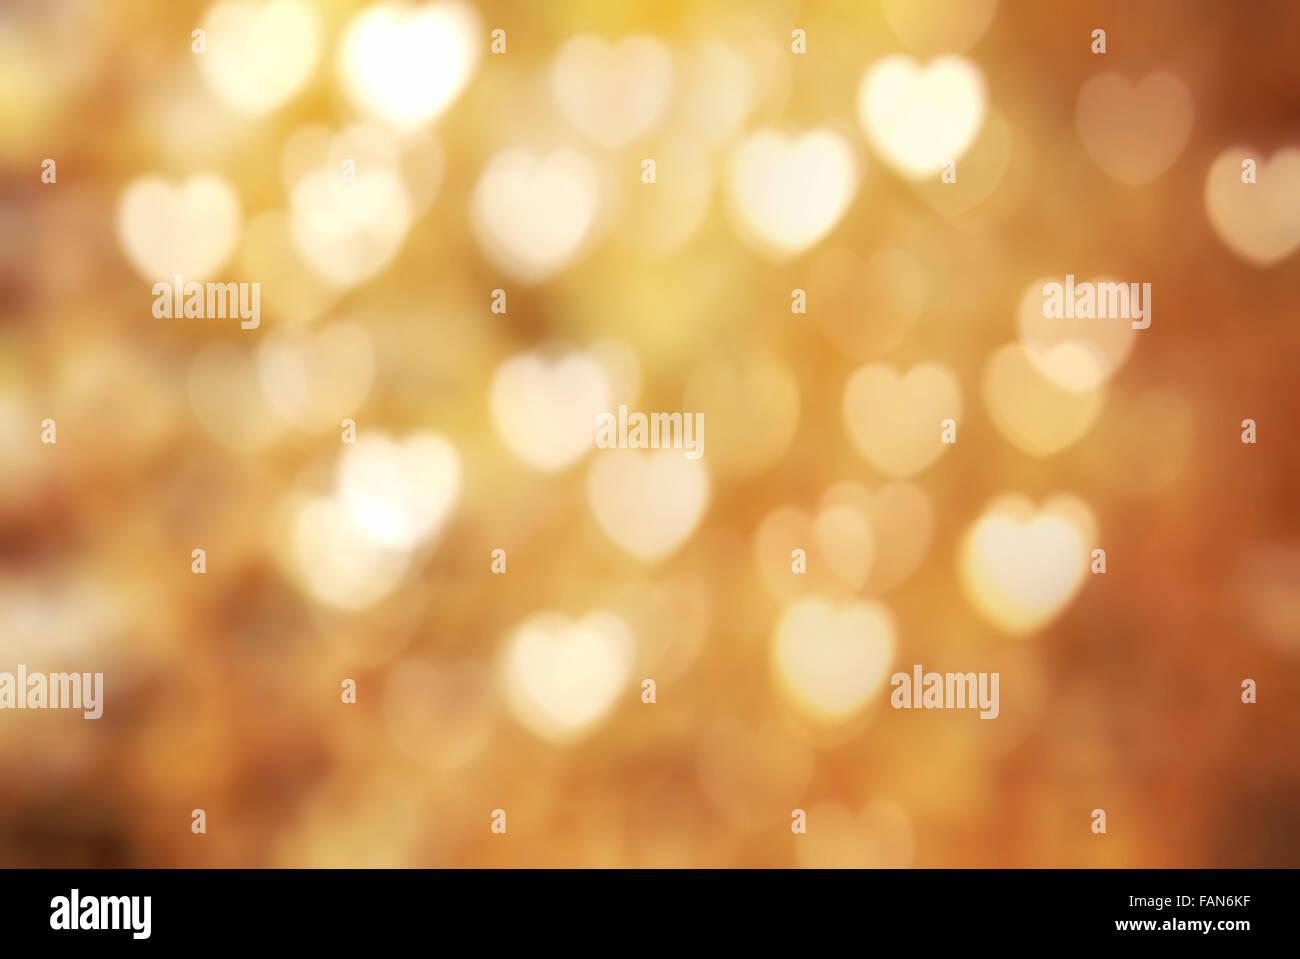 Golden texture bokeh of light. Element of design. - Stock Image